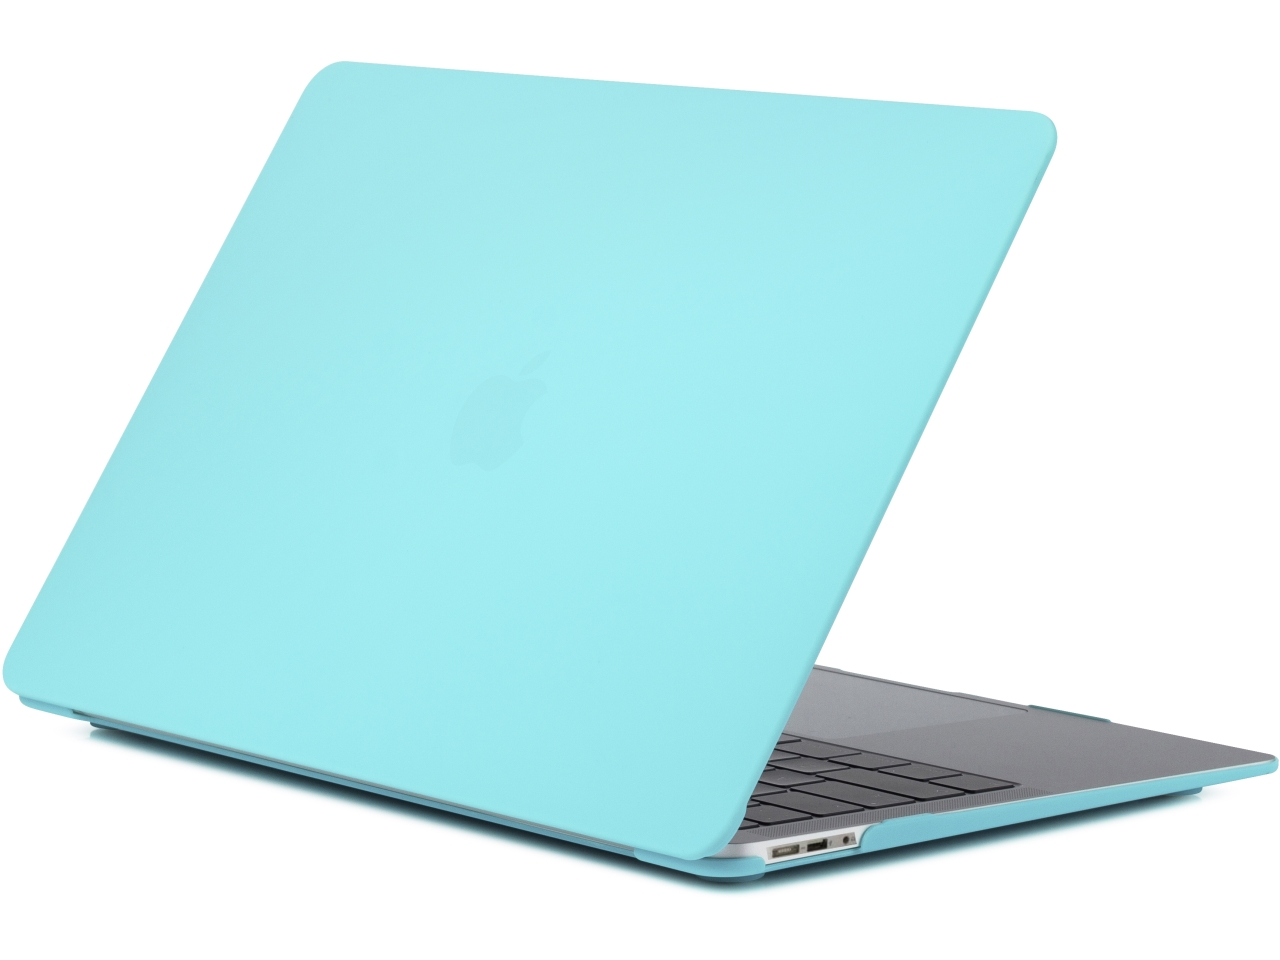 apple apple macbook macbook air 13 kein retina esons. Black Bedroom Furniture Sets. Home Design Ideas